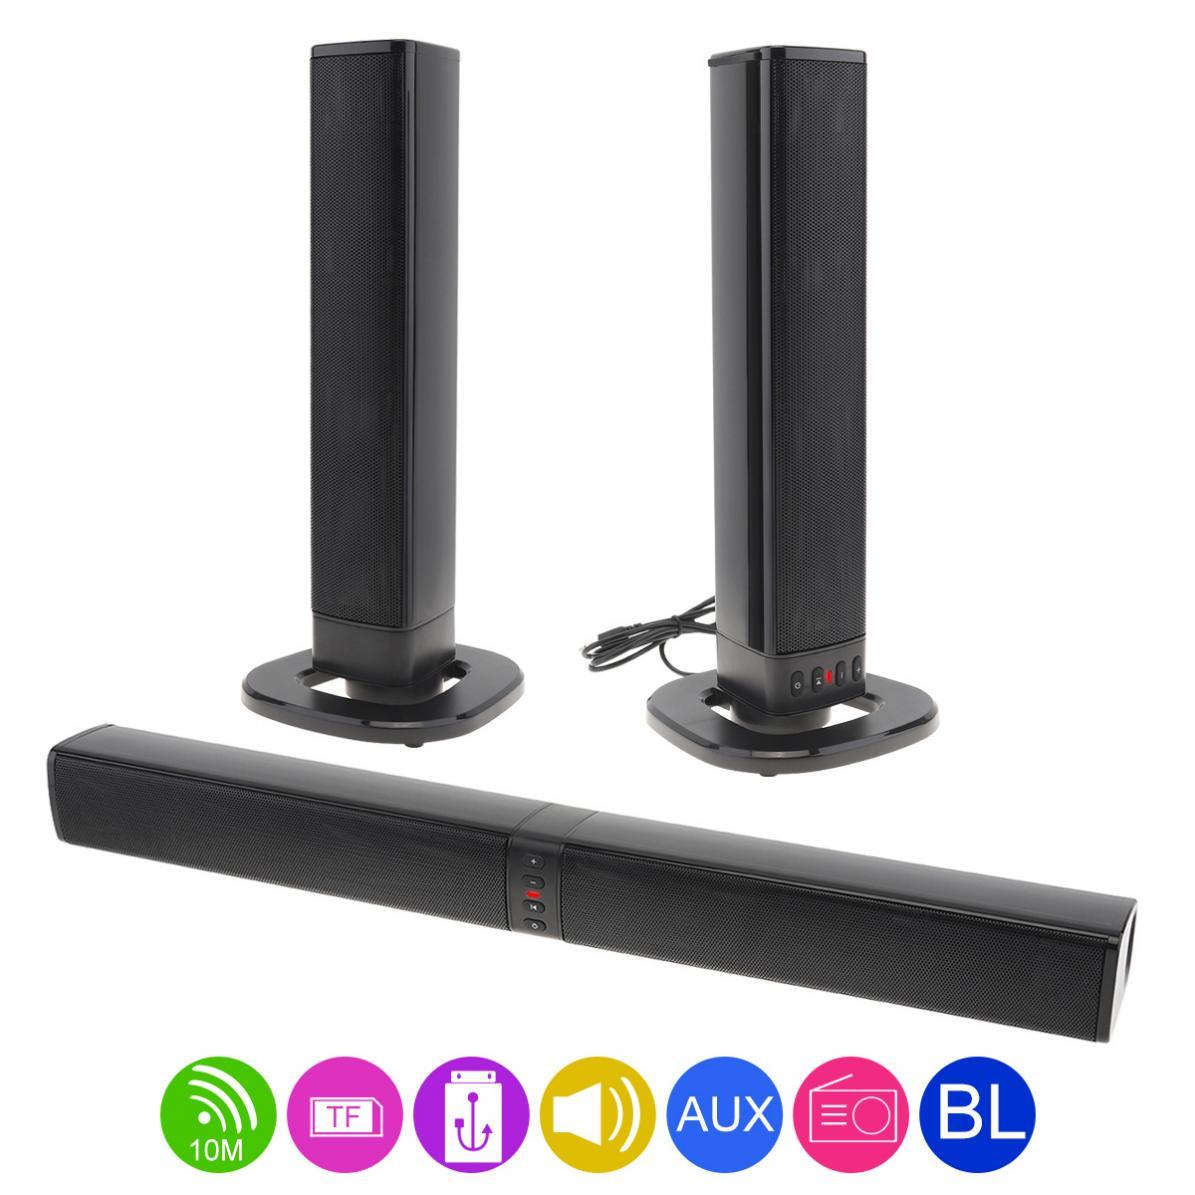 BS 36 Home Theater Sensurround Bluetooth Foldable and Split Soundbar Speaker with 4 Full Range Horns for TV / PC / Phone